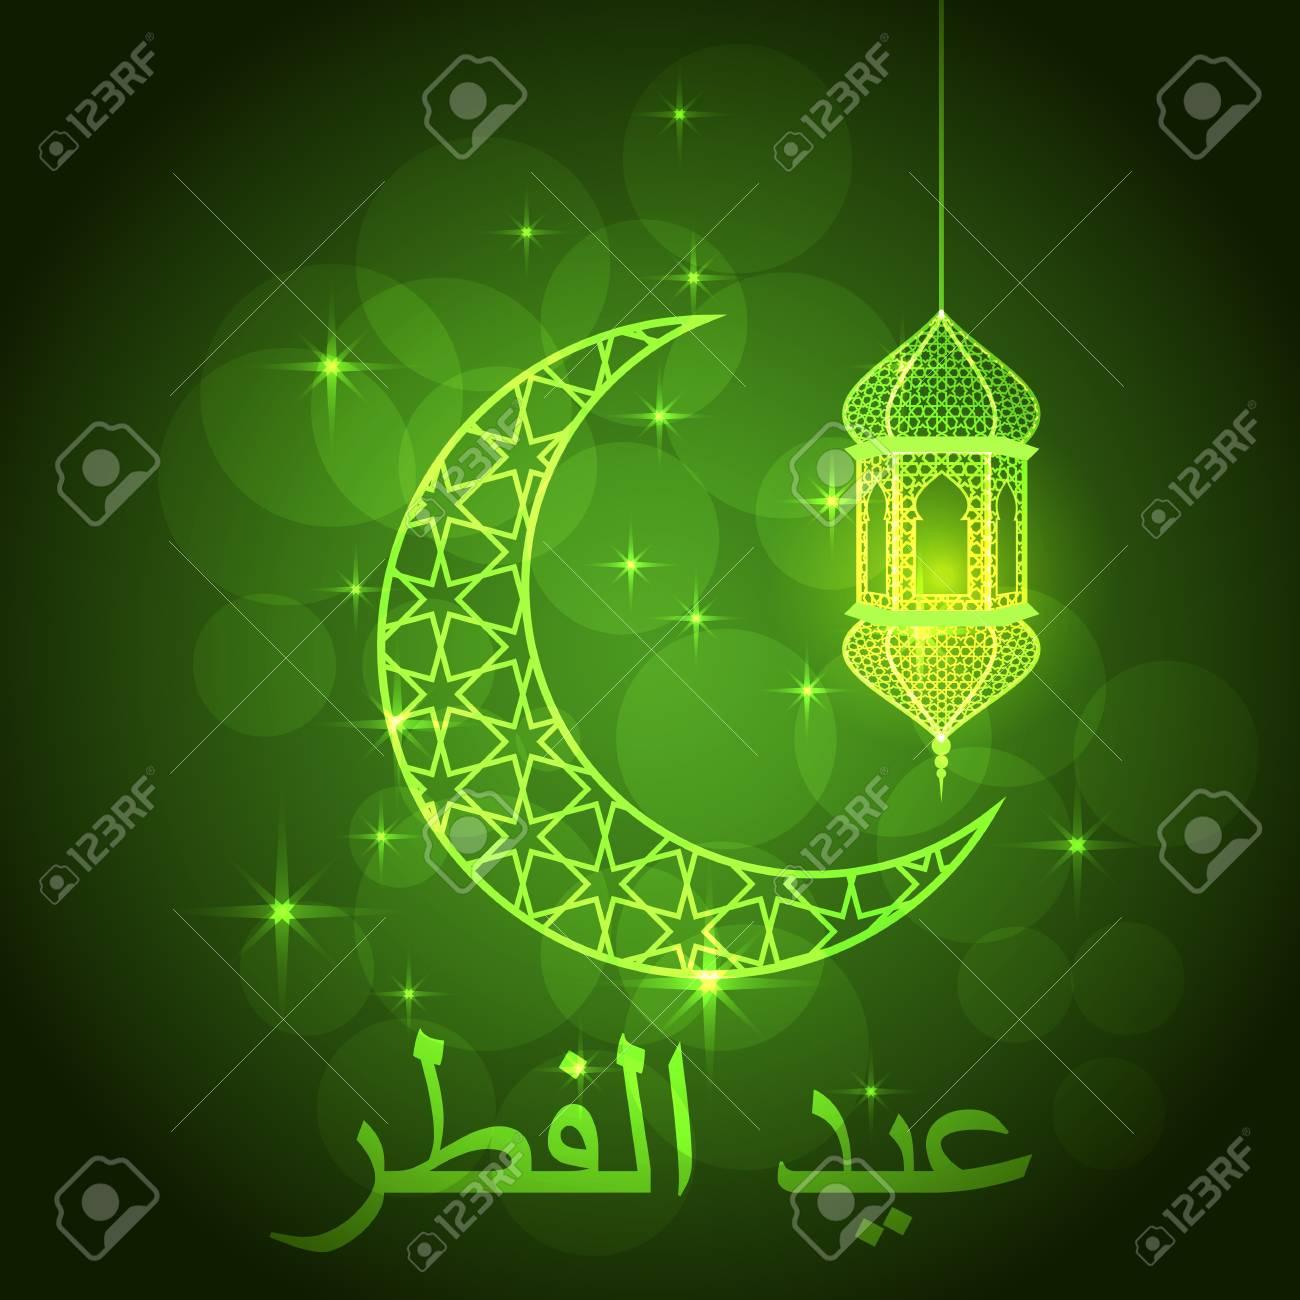 Popular Different Eid Al-Fitr Greeting - 58667550-eid-al-fitr-greeting-card-on-green-background-vector-illustration-eid-al-fitr-means-festival-of-brea  Image_478996 .jpg